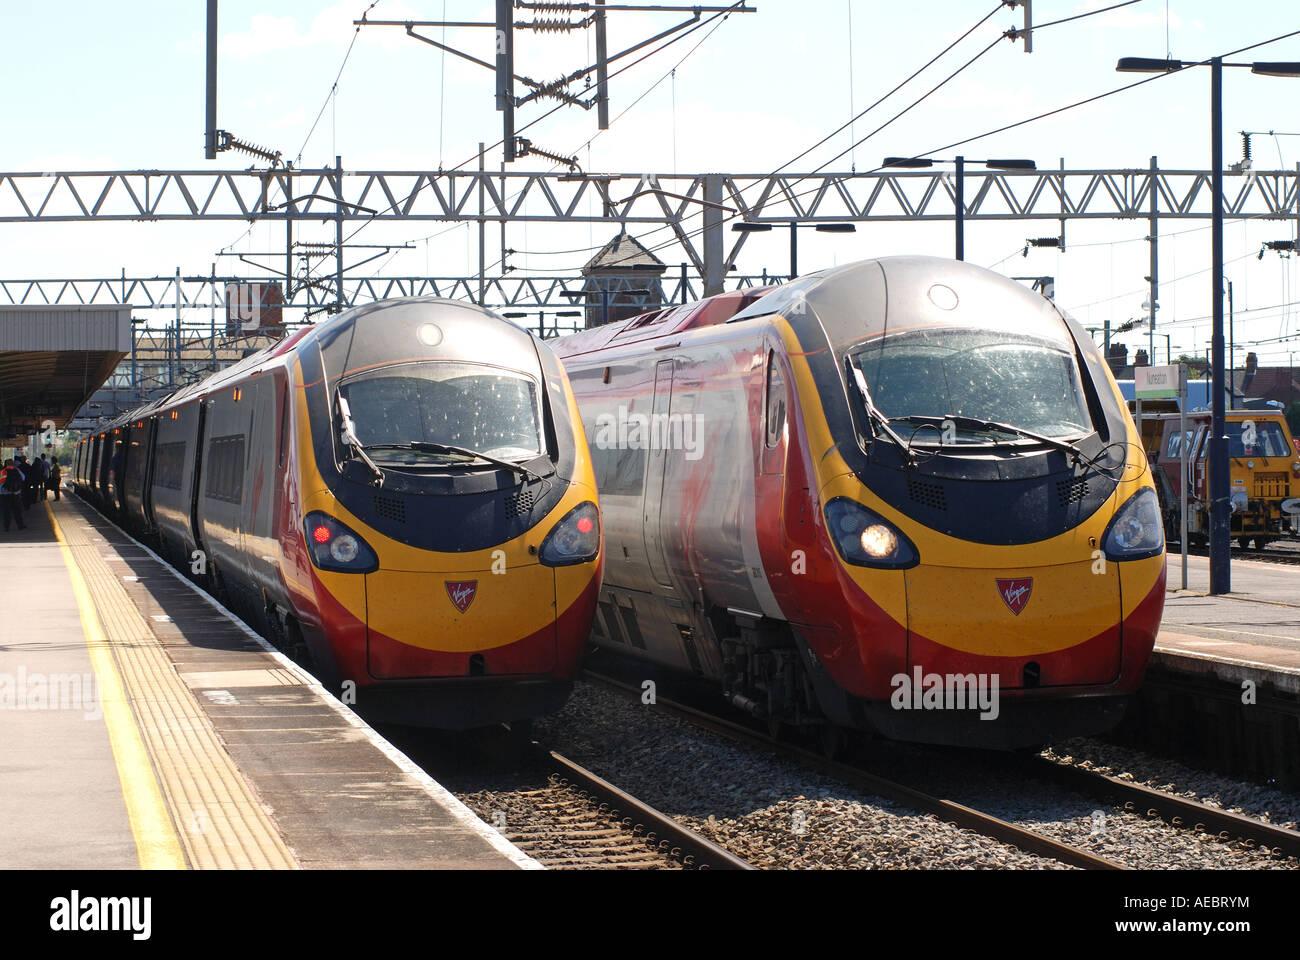 Virgin Trains Pendolino electric trains at Nuneaton station, Warwickshire, England, UK Stock Photo